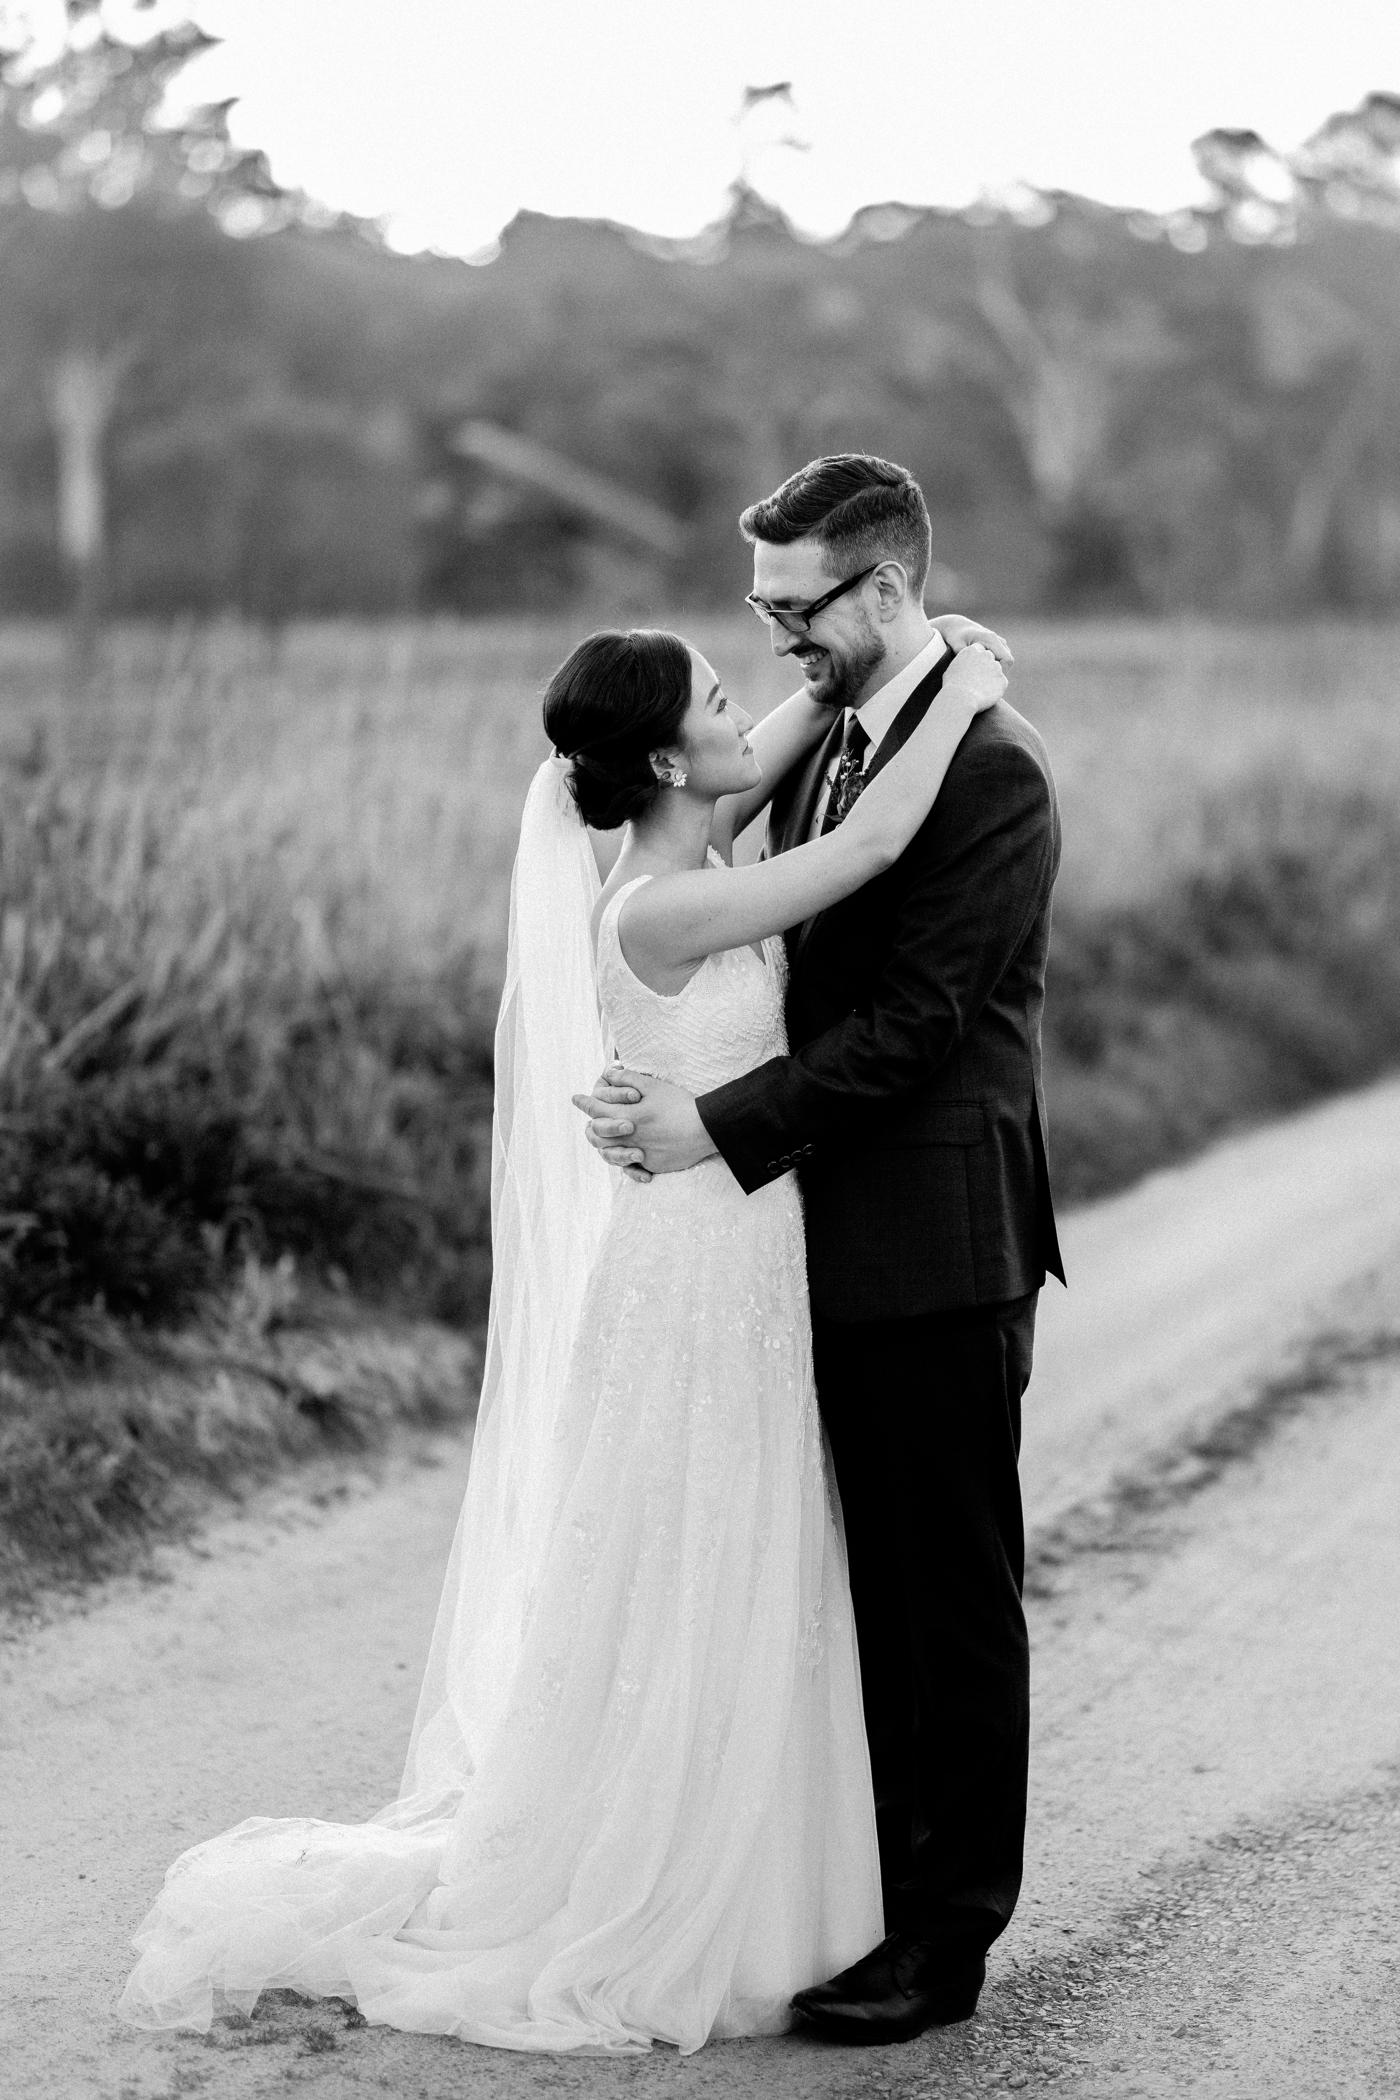 Adelaide Wedding Photographer - Al Ru Farm Wedding in Adelaide - Natural Wedding Photography Australia - www.katherineschultzphotography.com - Todd & Rachel_0053.jpg